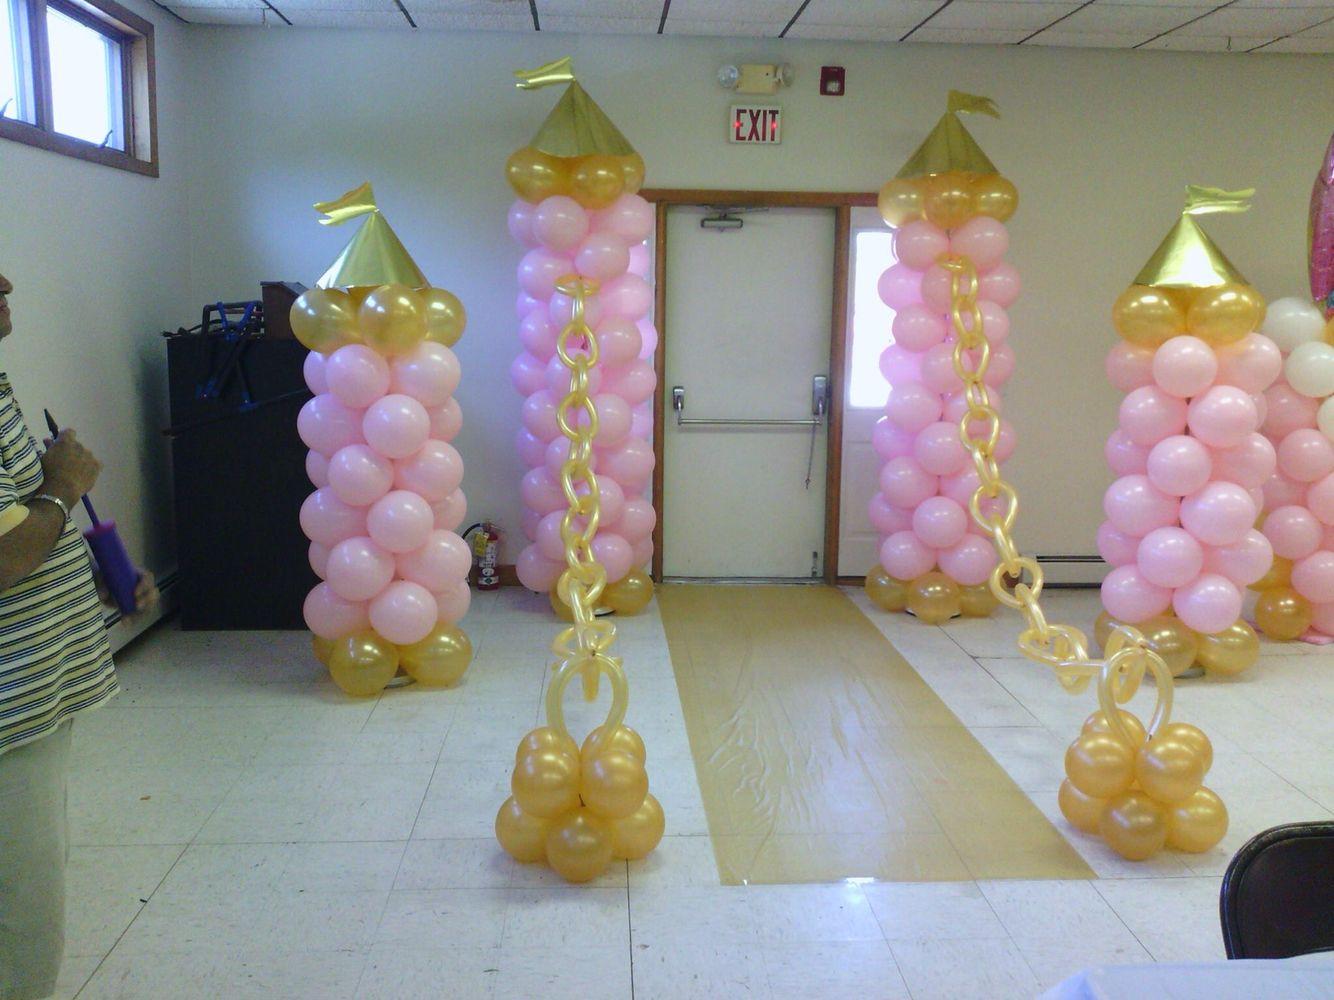 Princess Balloon Decoration Princessthemeballoindecor Princess Theme Balloons Decorations